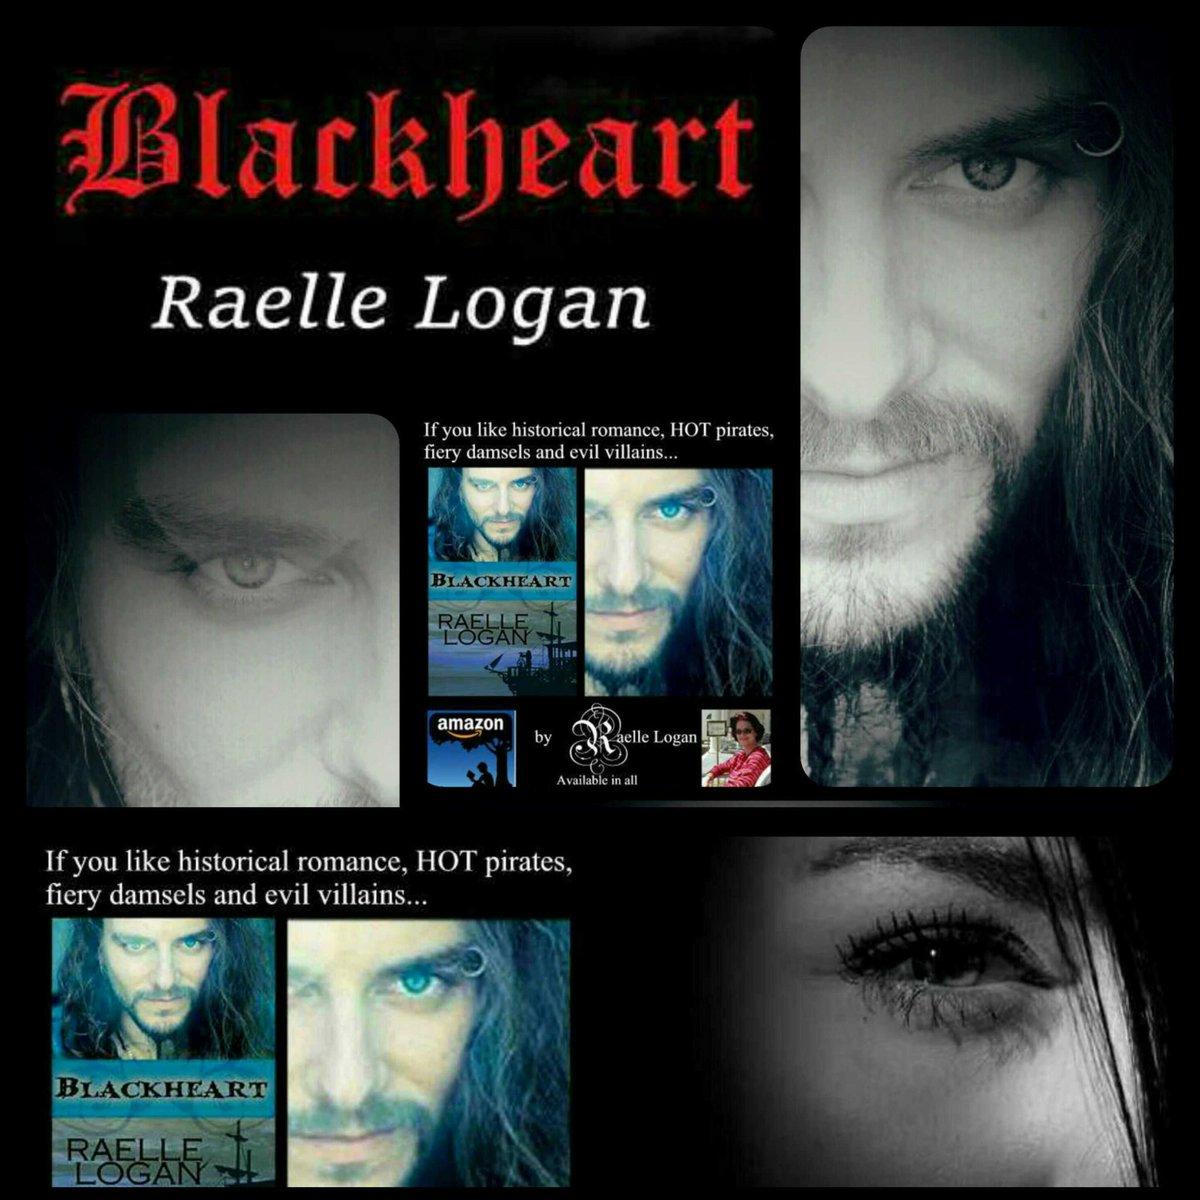 Under a Black Flag Sails Capt BLACKHEART!#Romance #books #read #storytelling  #gamedev #fantasy #RomanticSuspense #historicalromance #book <br>http://pic.twitter.com/S0TH1cVaKp